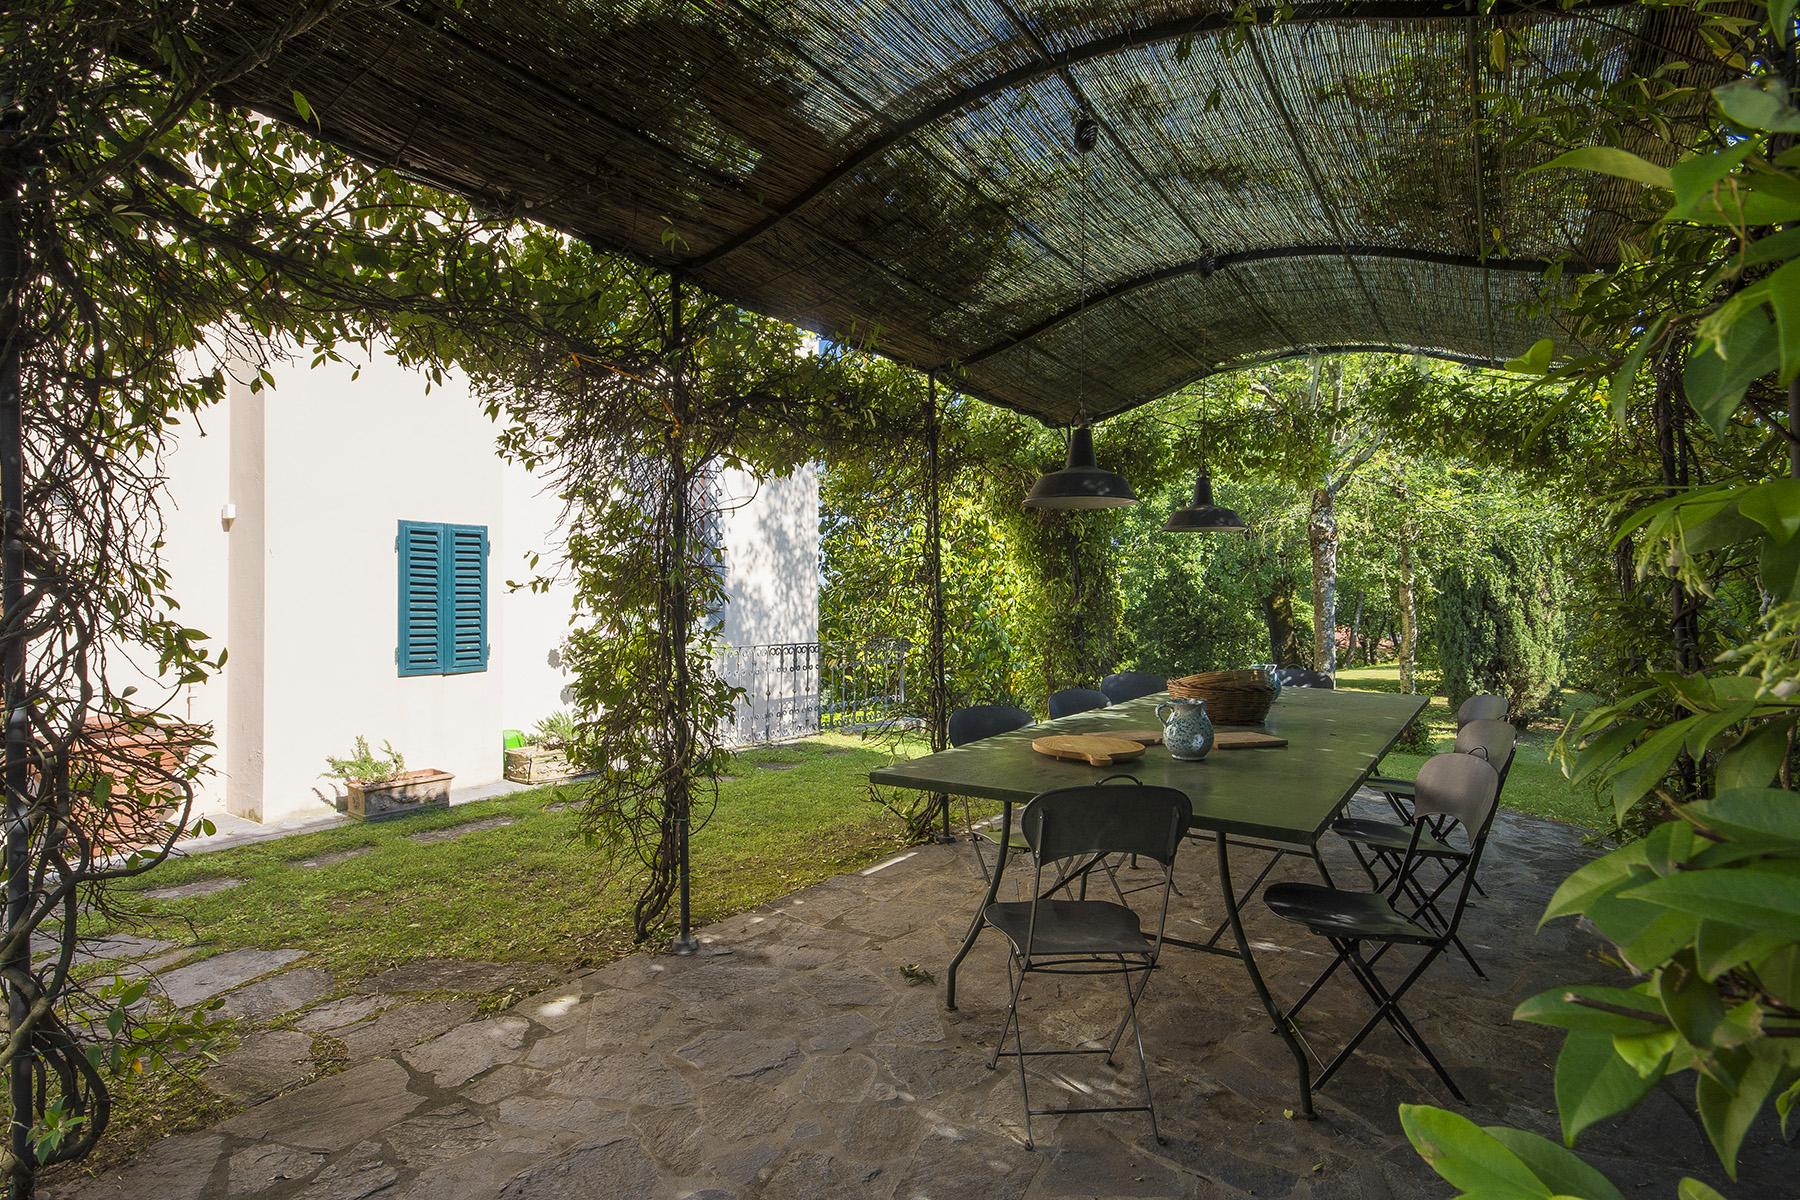 Villa in Vendita a Lucca: 5 locali, 600 mq - Foto 2